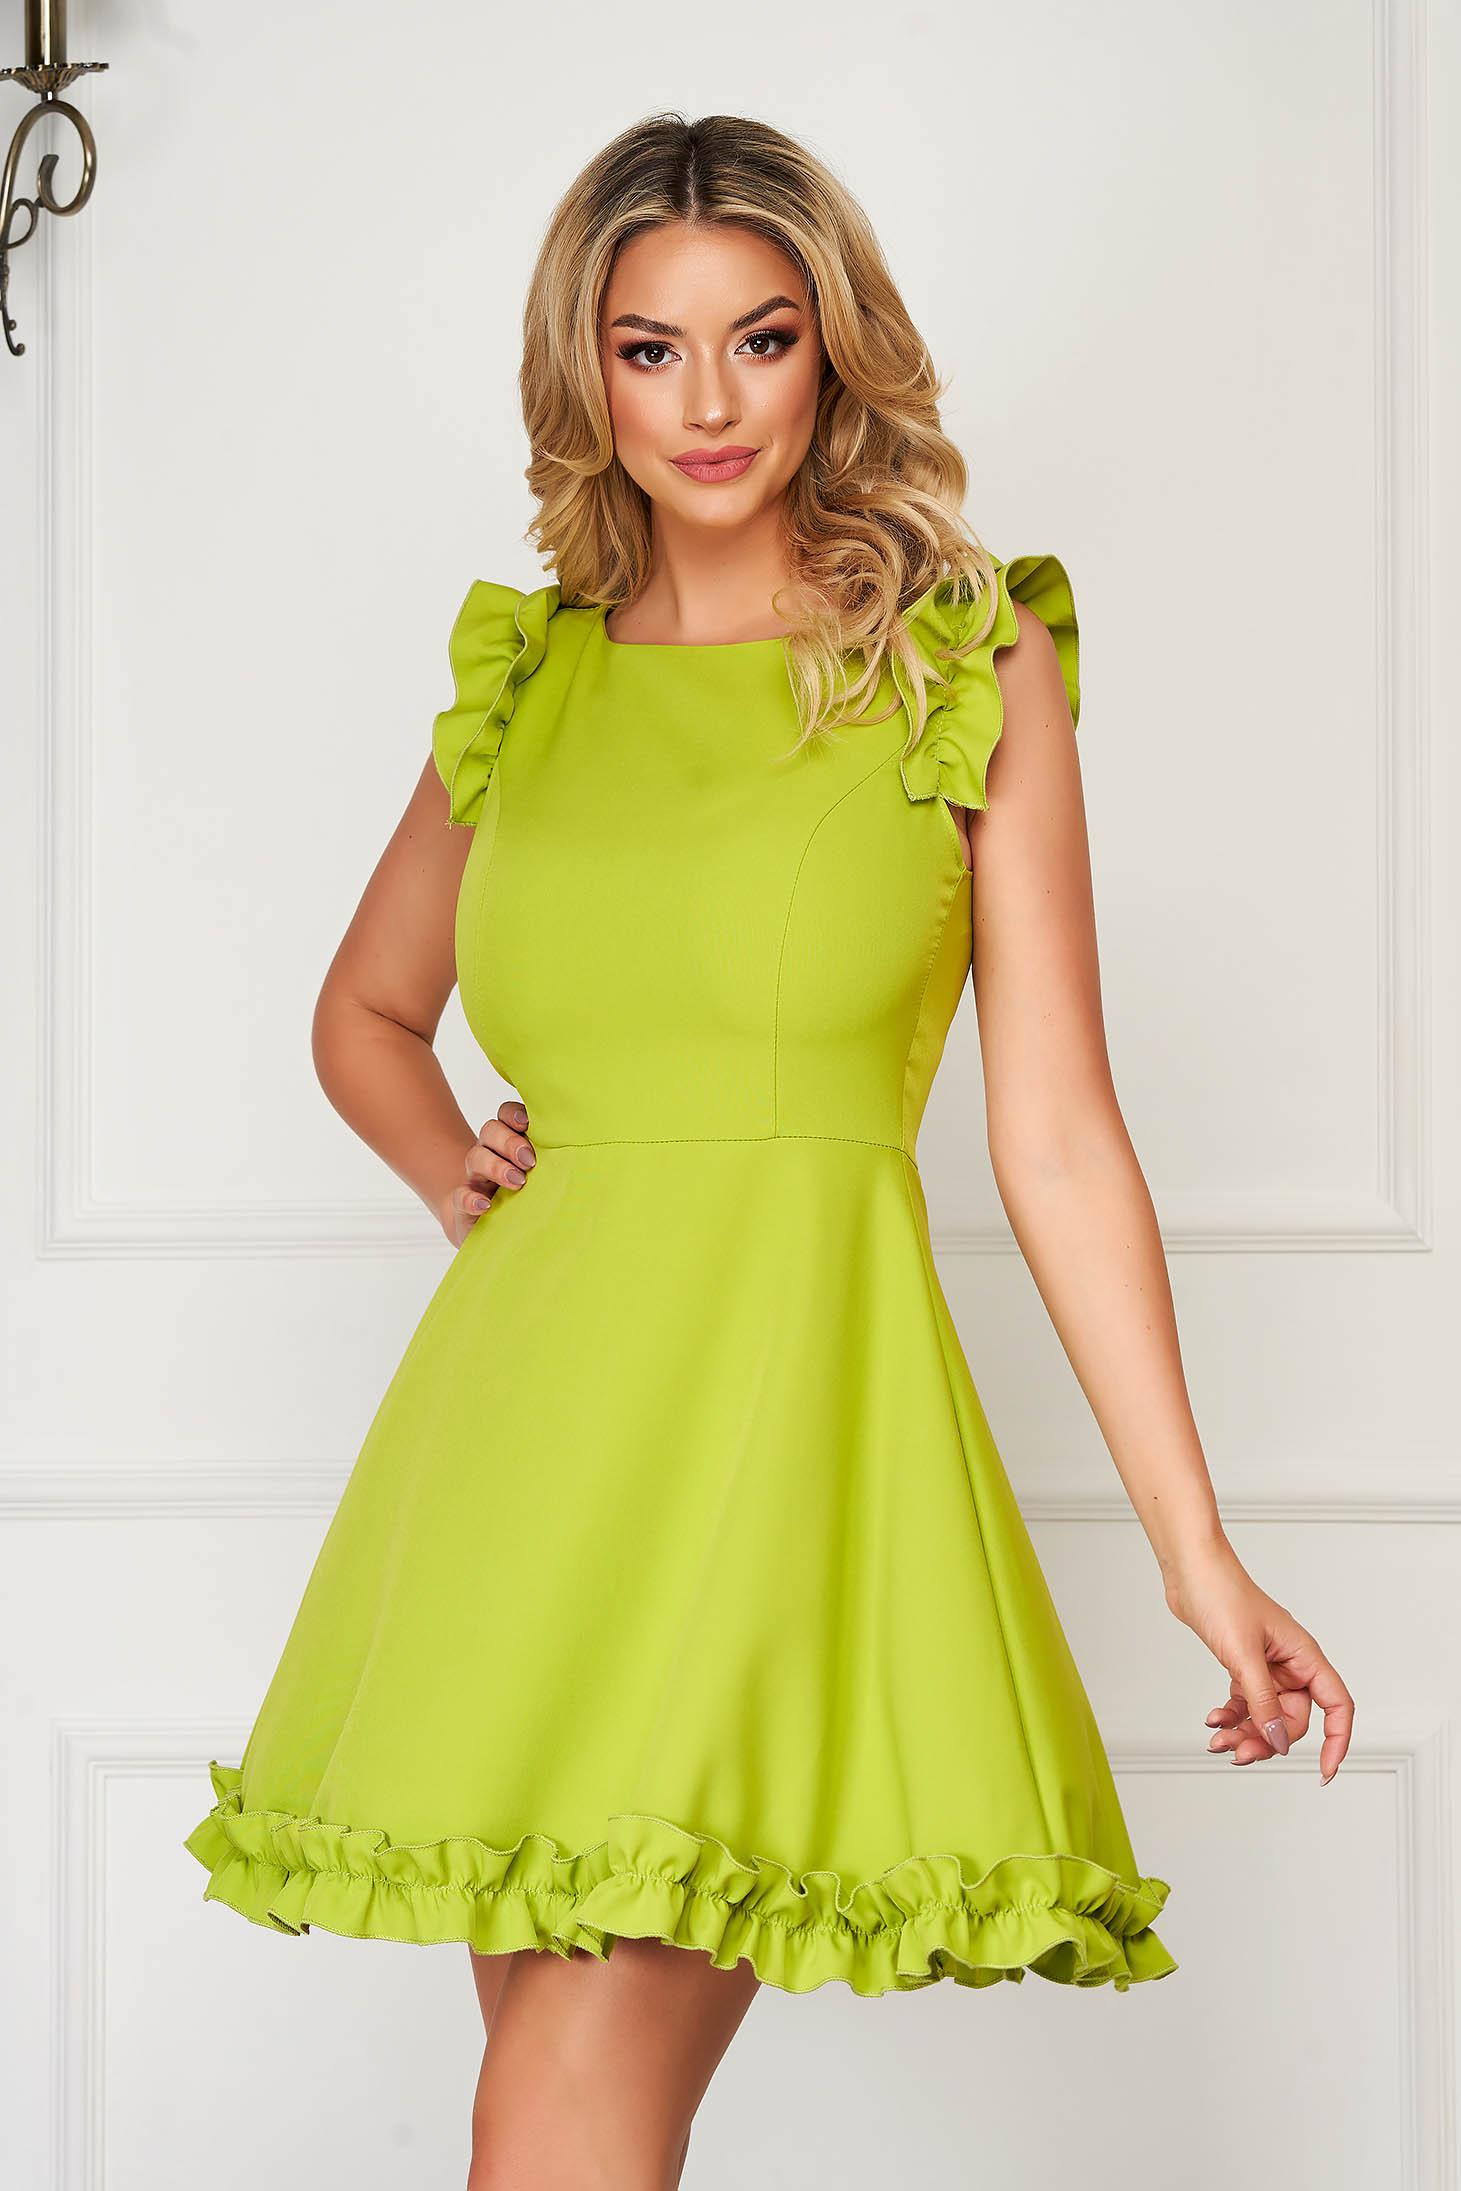 StarShinerS green dress elegant short cut cloth with ruffled sleeves